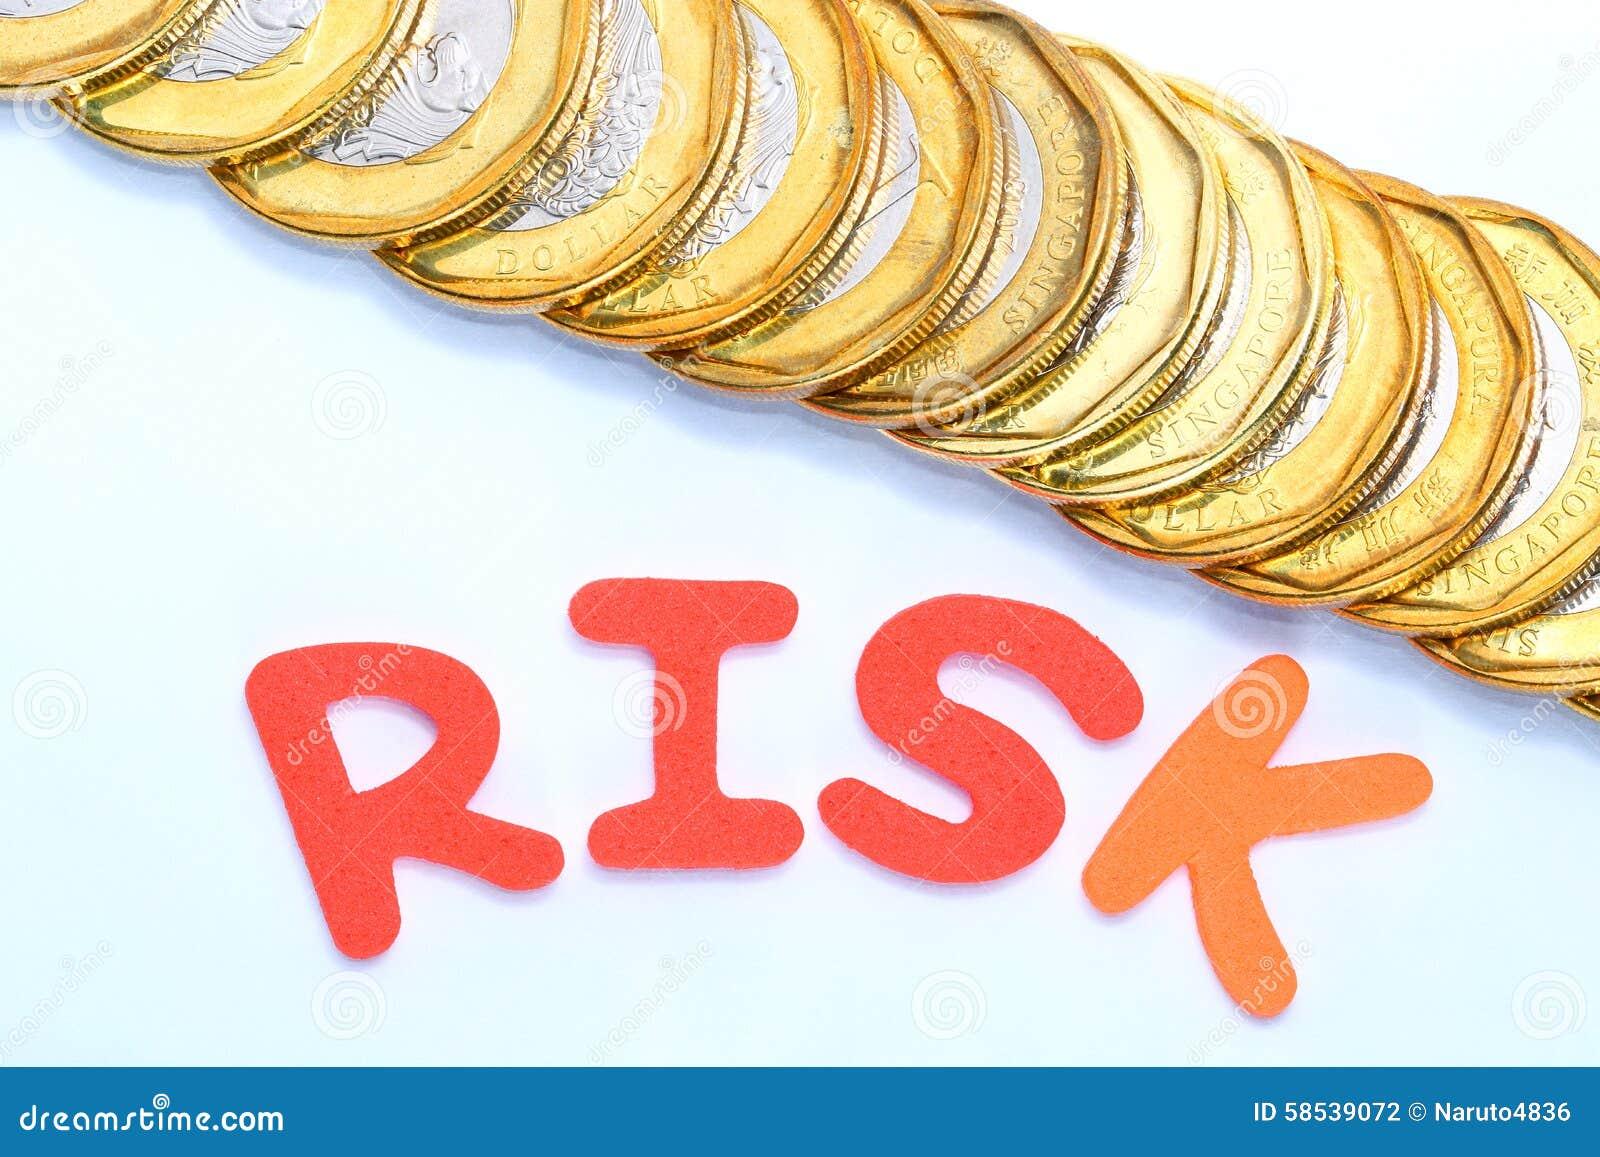 Finansiell risk